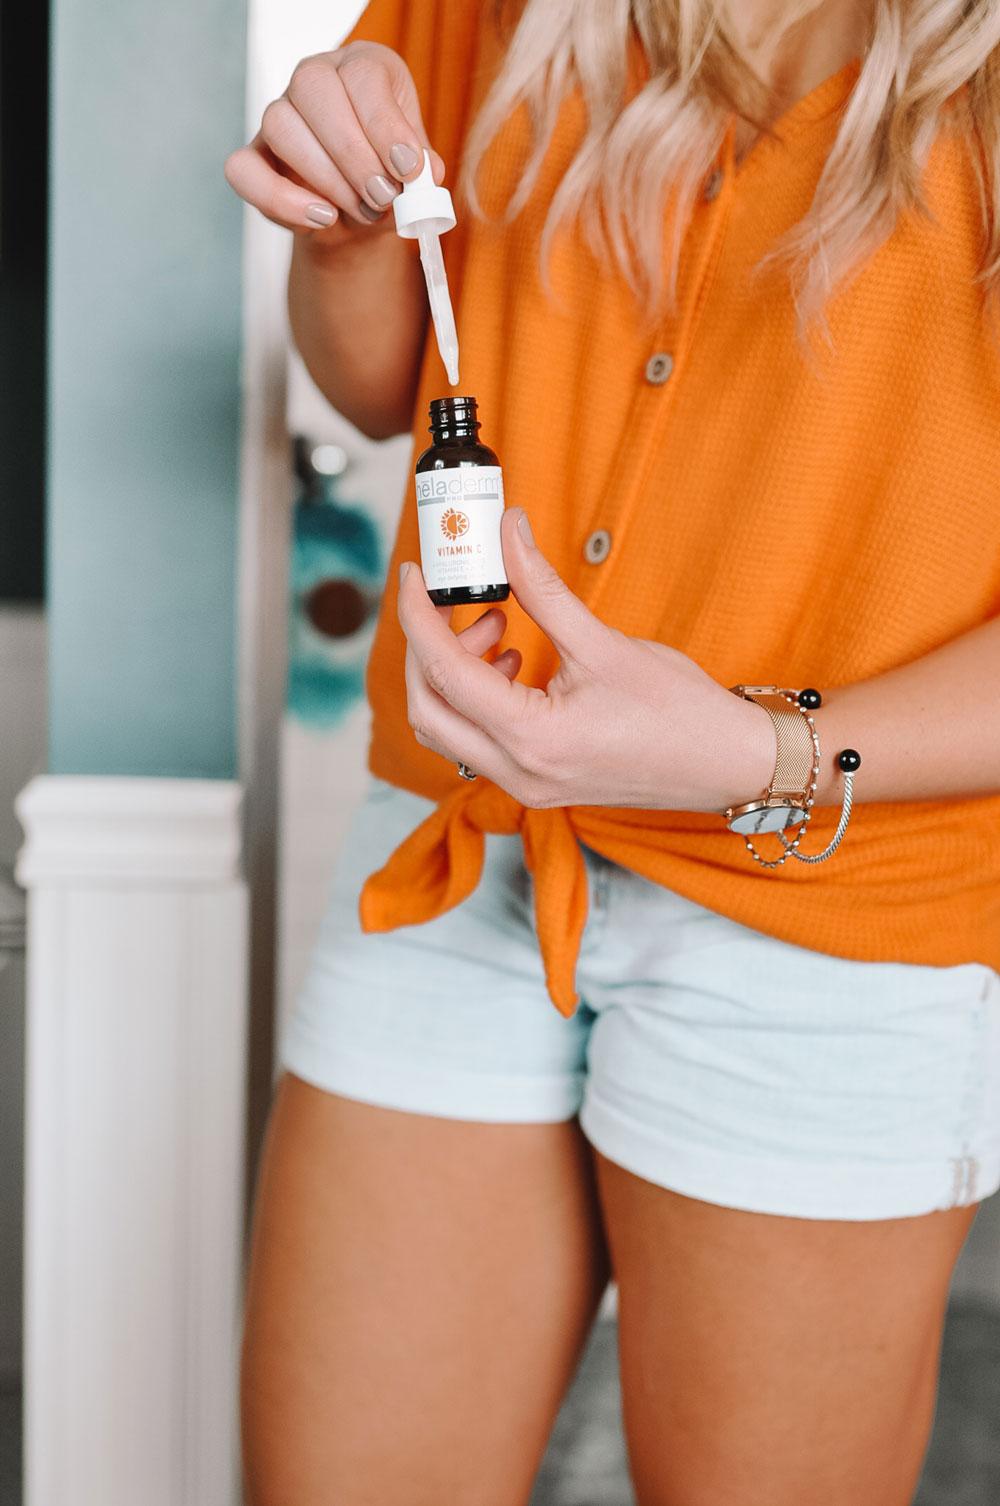 Blogger Amanda Martin shares how to brighten skin with Heladerm's Vitamin C serum